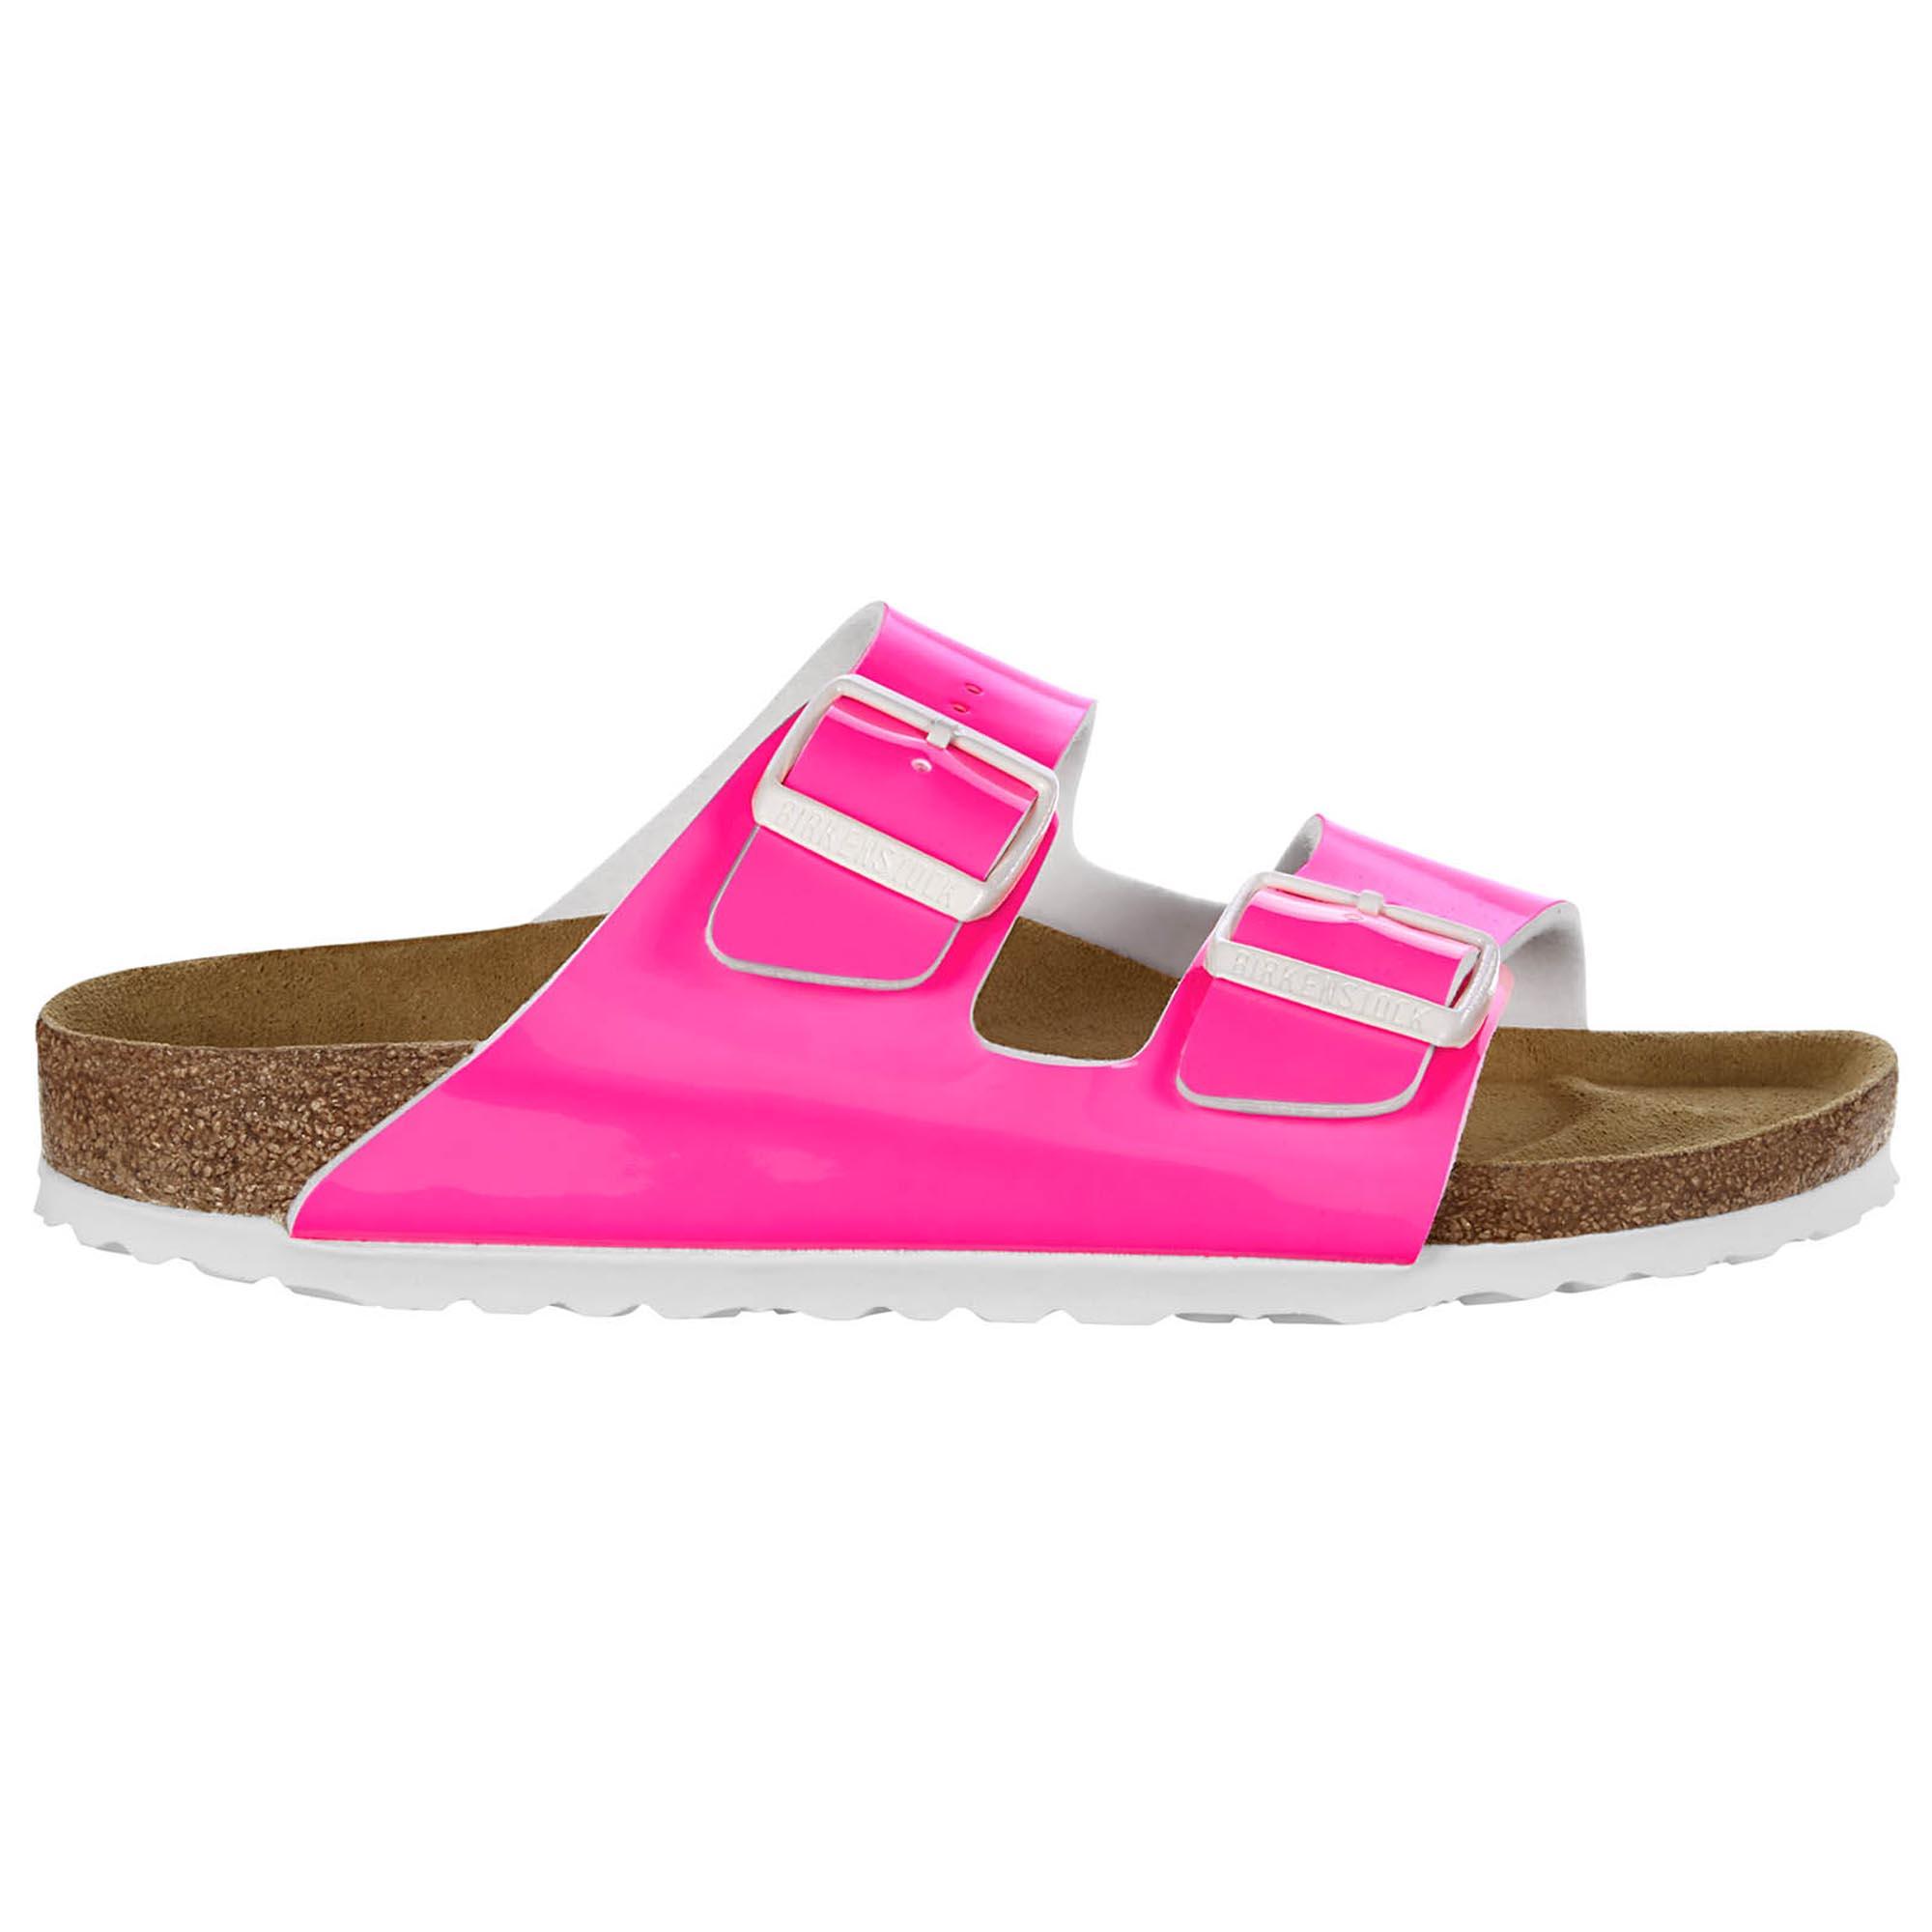 Gizeh Birko Flor Patent Neon Pink Patent